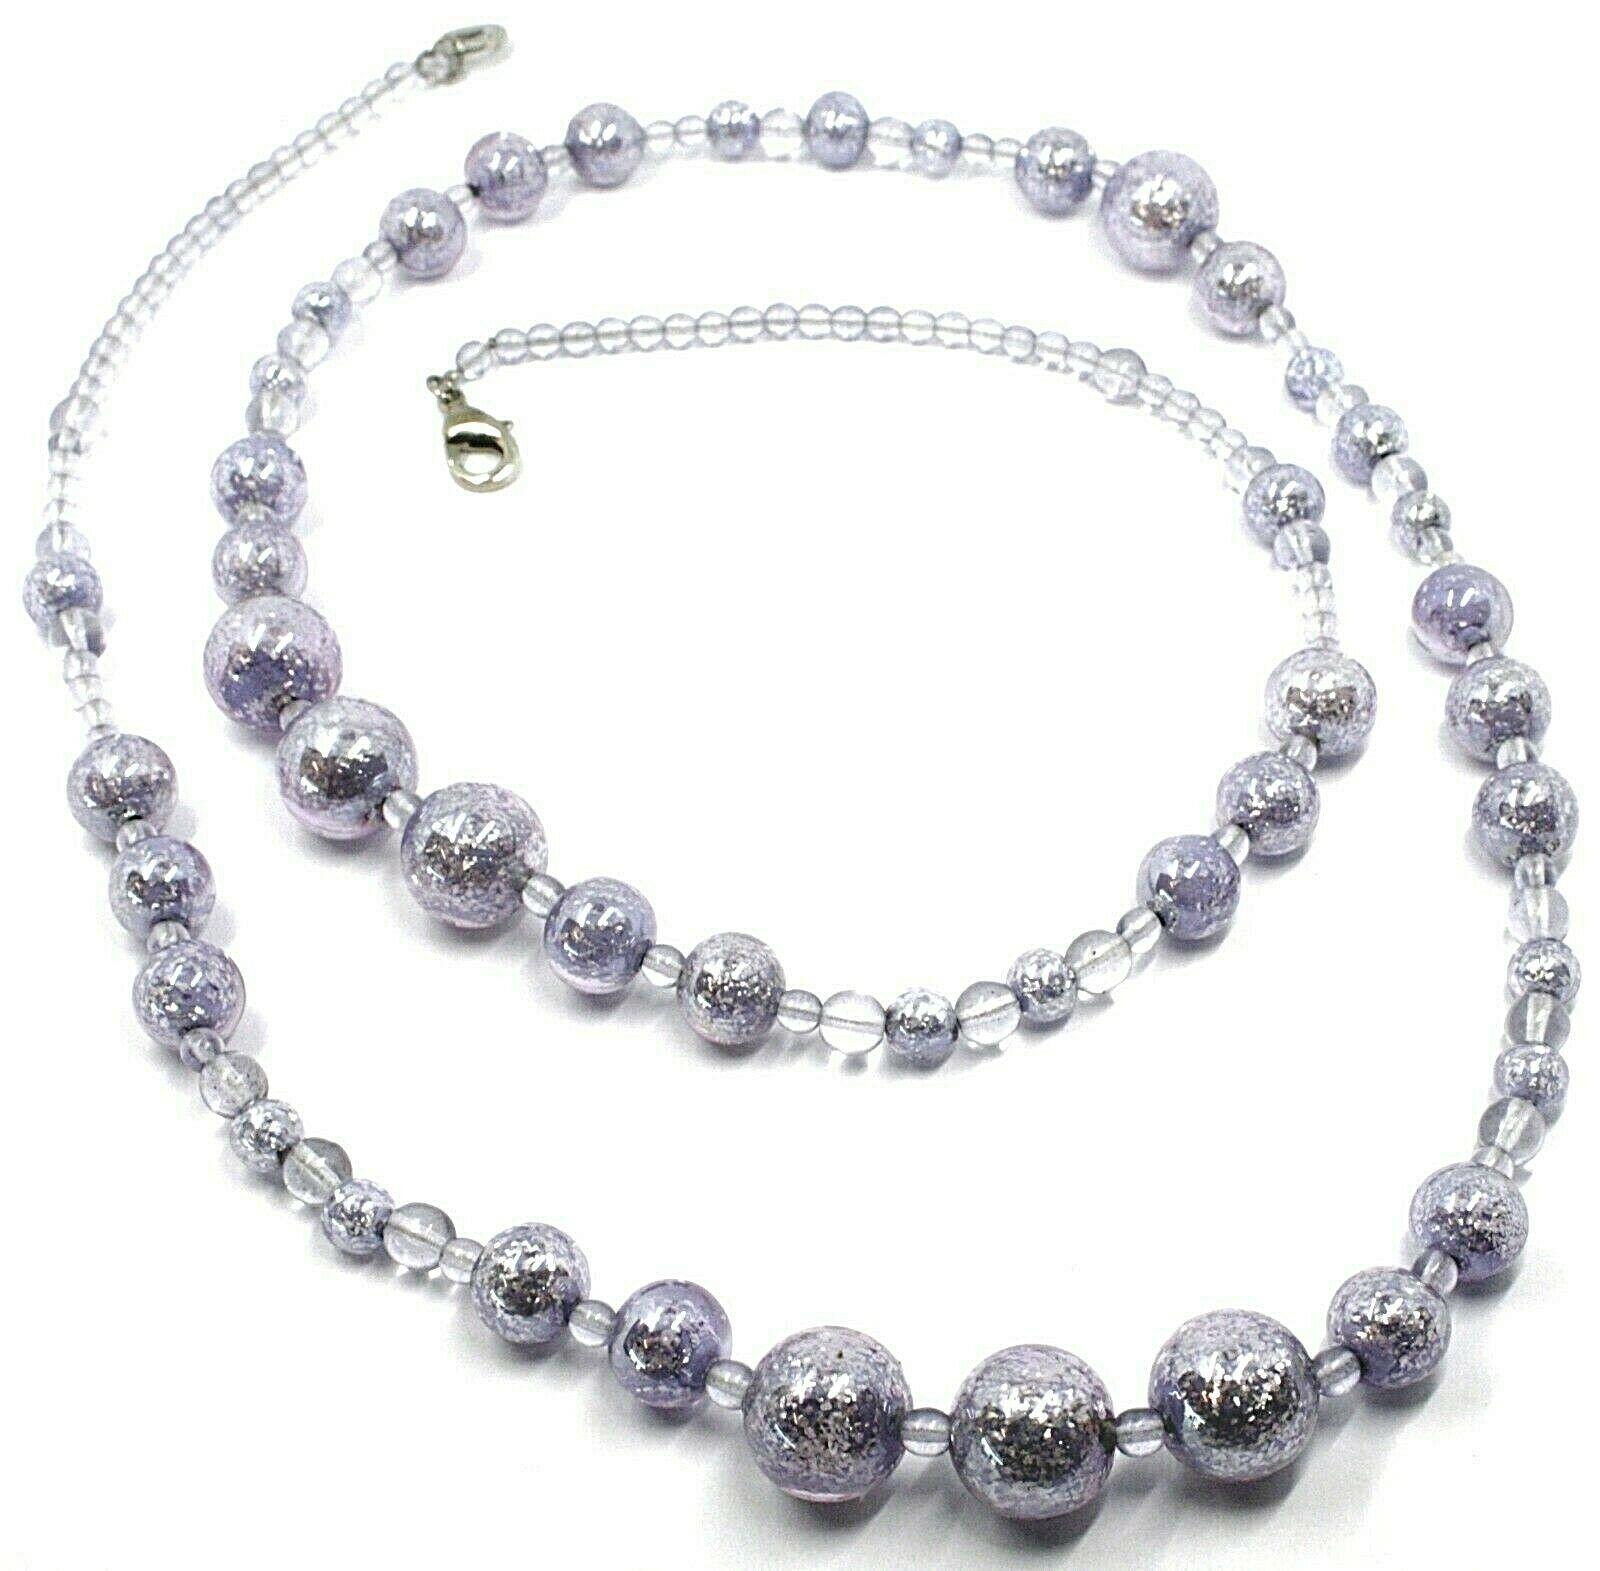 Necklace Antica Murrina Venezia,CO971A04,Spheres Purple,Length 35 3/8in